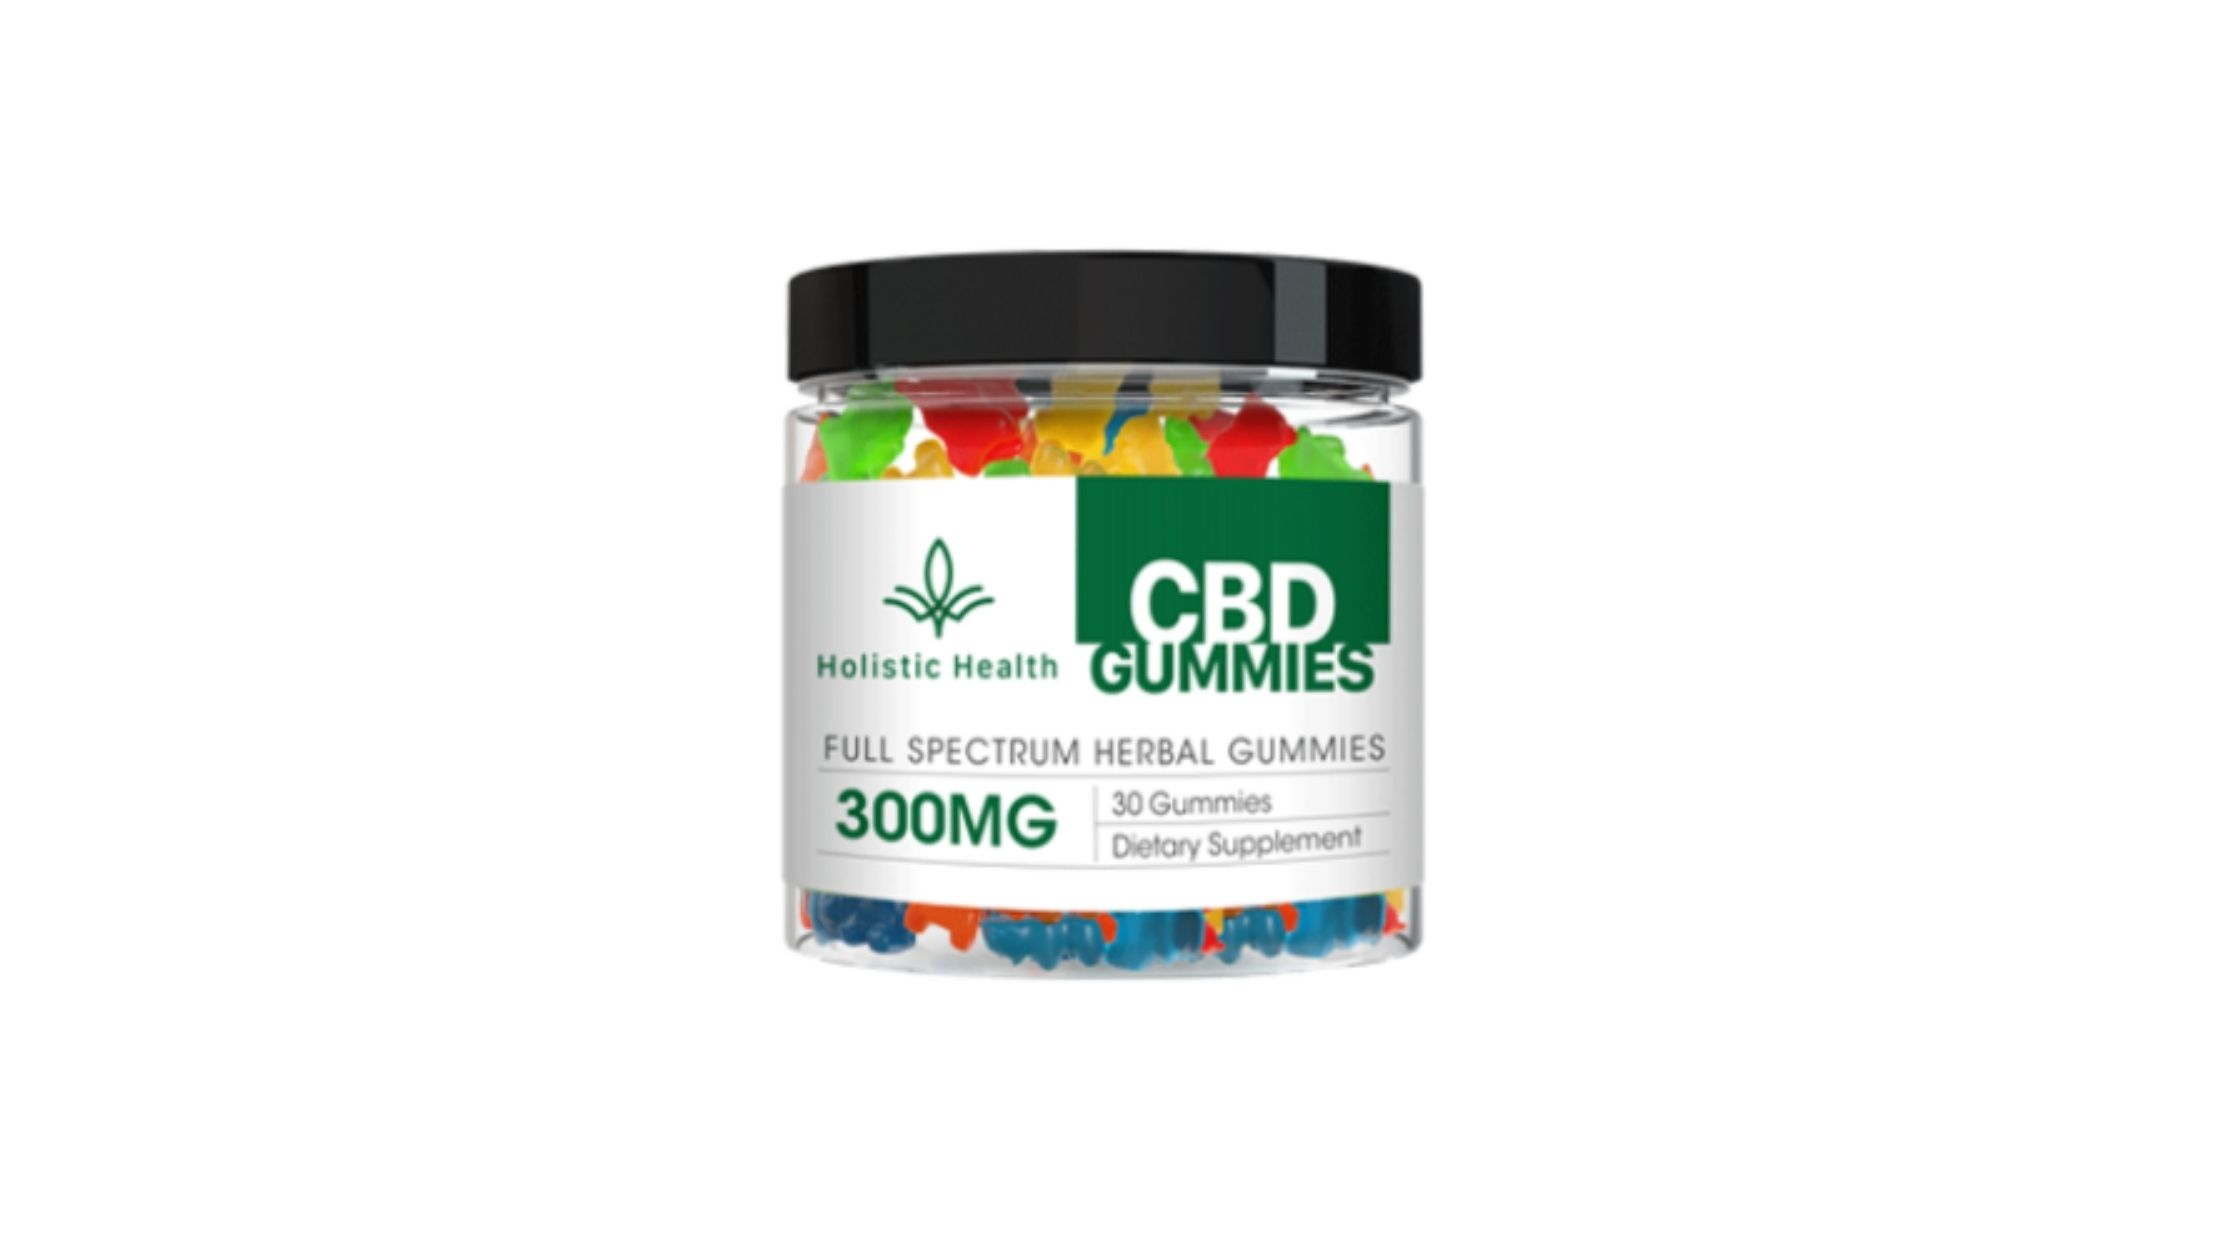 Holistic-Health-CBD-Gummies